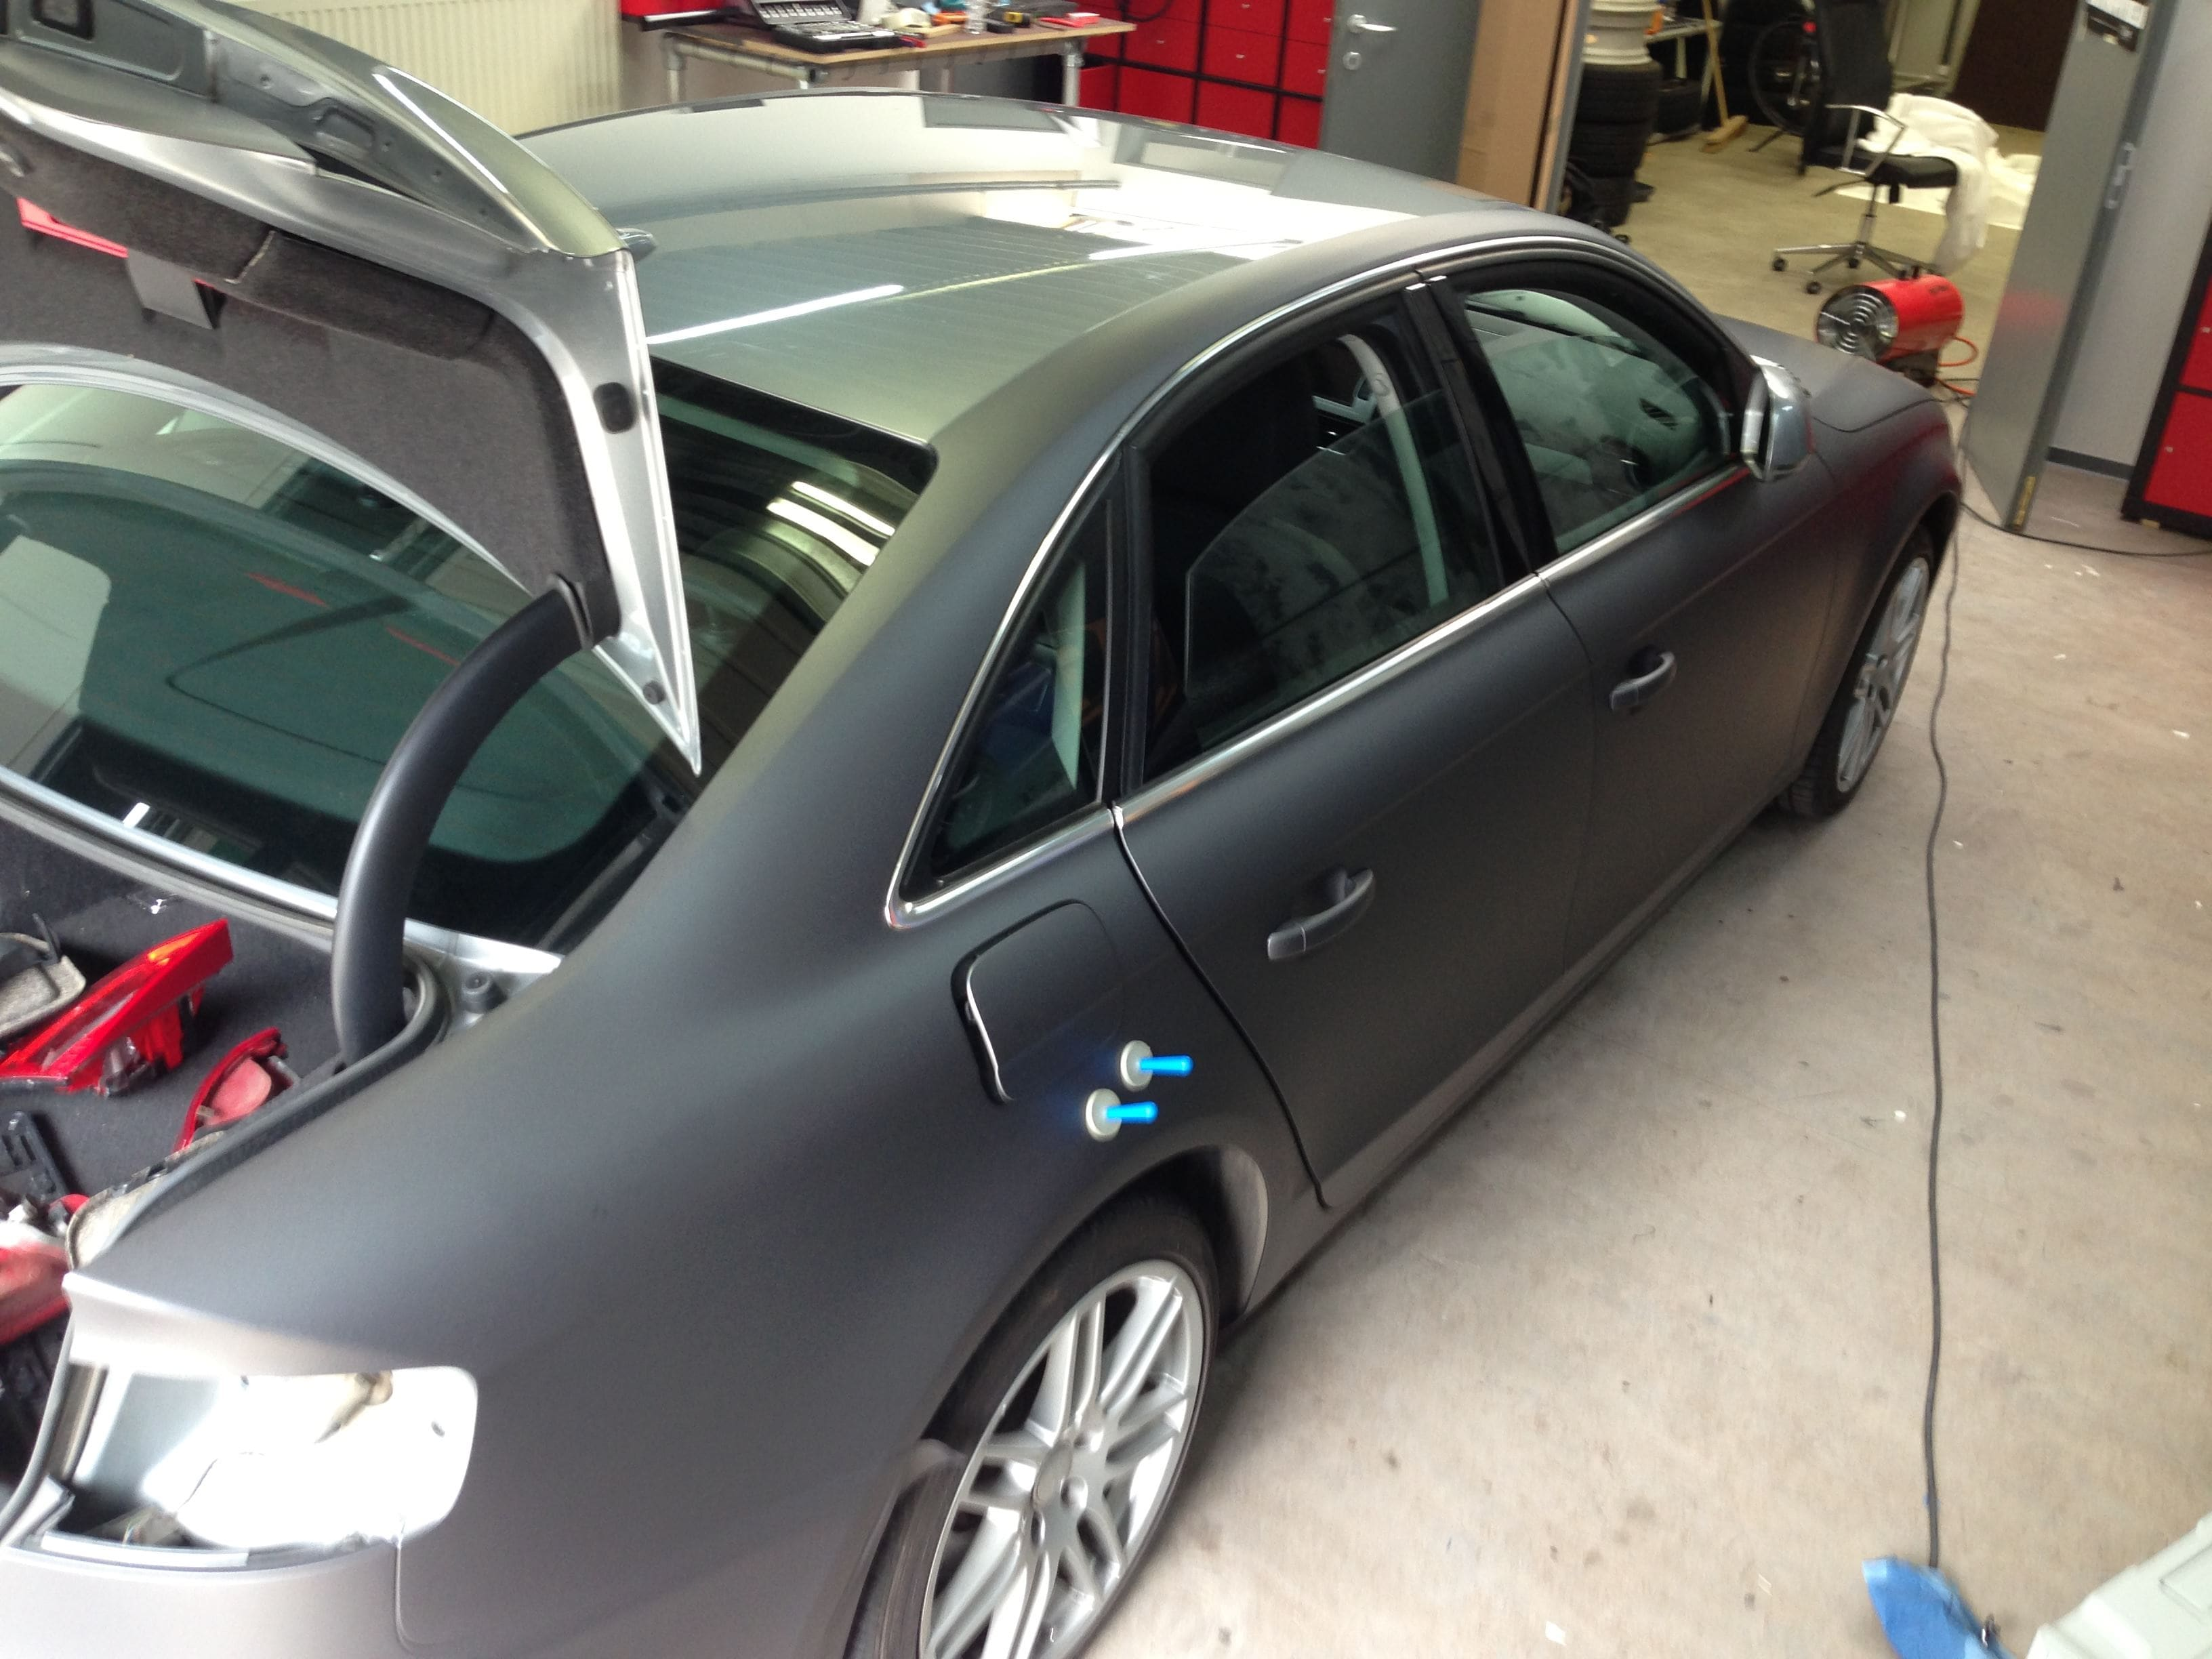 Audi A4 B6 met Gunpowder Wrap, Carwrapping door Wrapmyride.nu Foto-nr:4504, ©2021